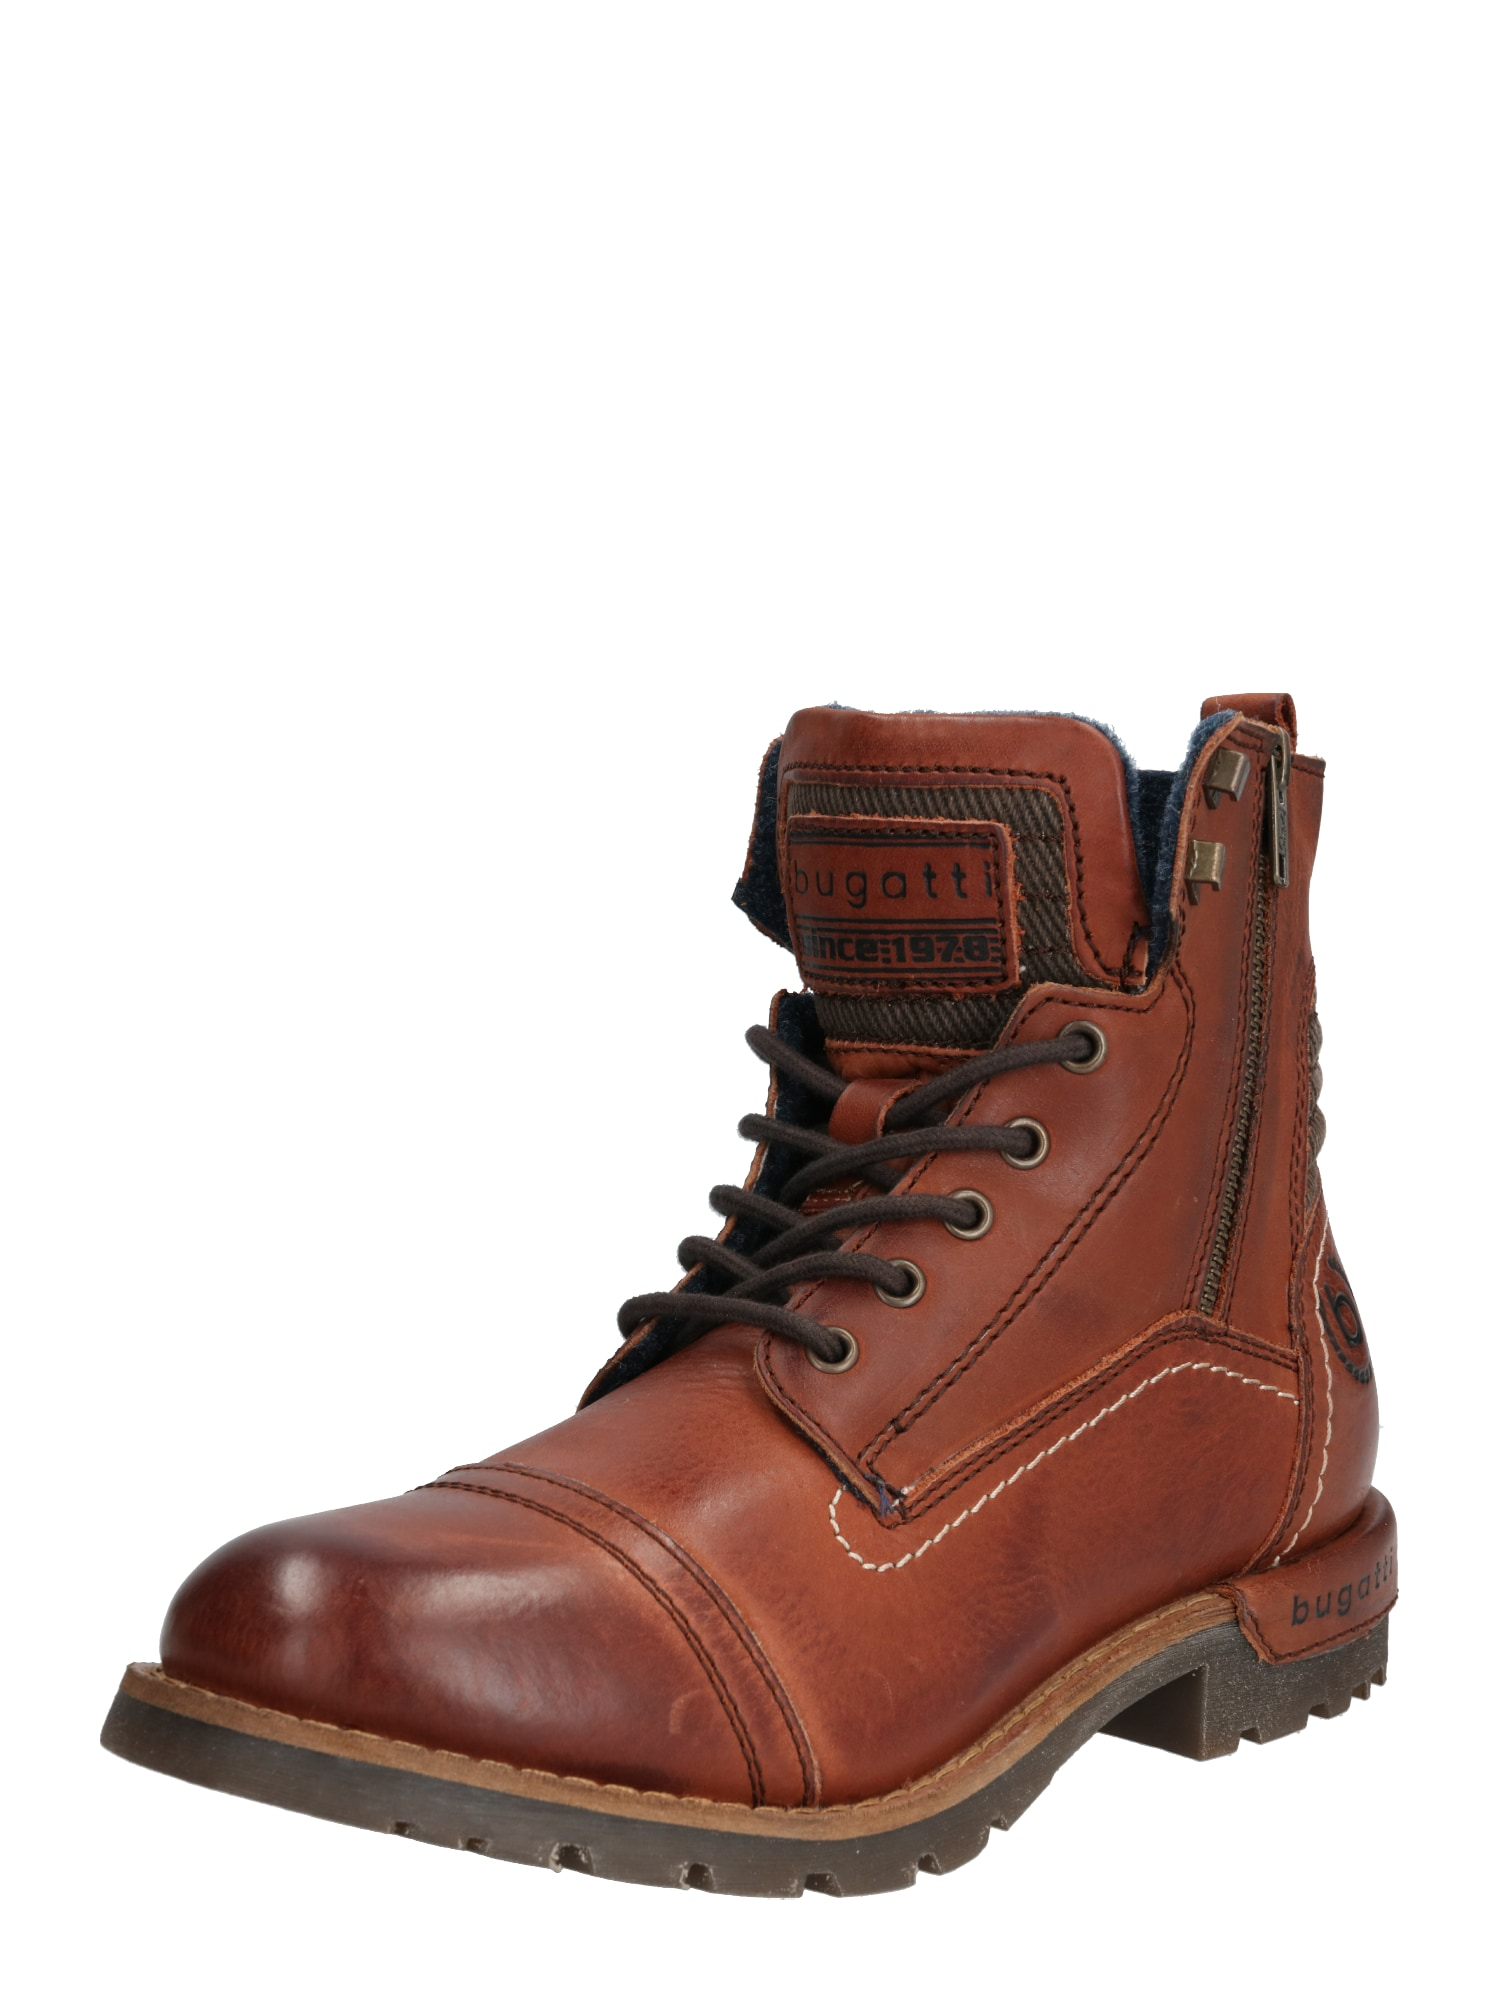 bugatti Auliniai batai su kulniuku 'Sentra' ruda